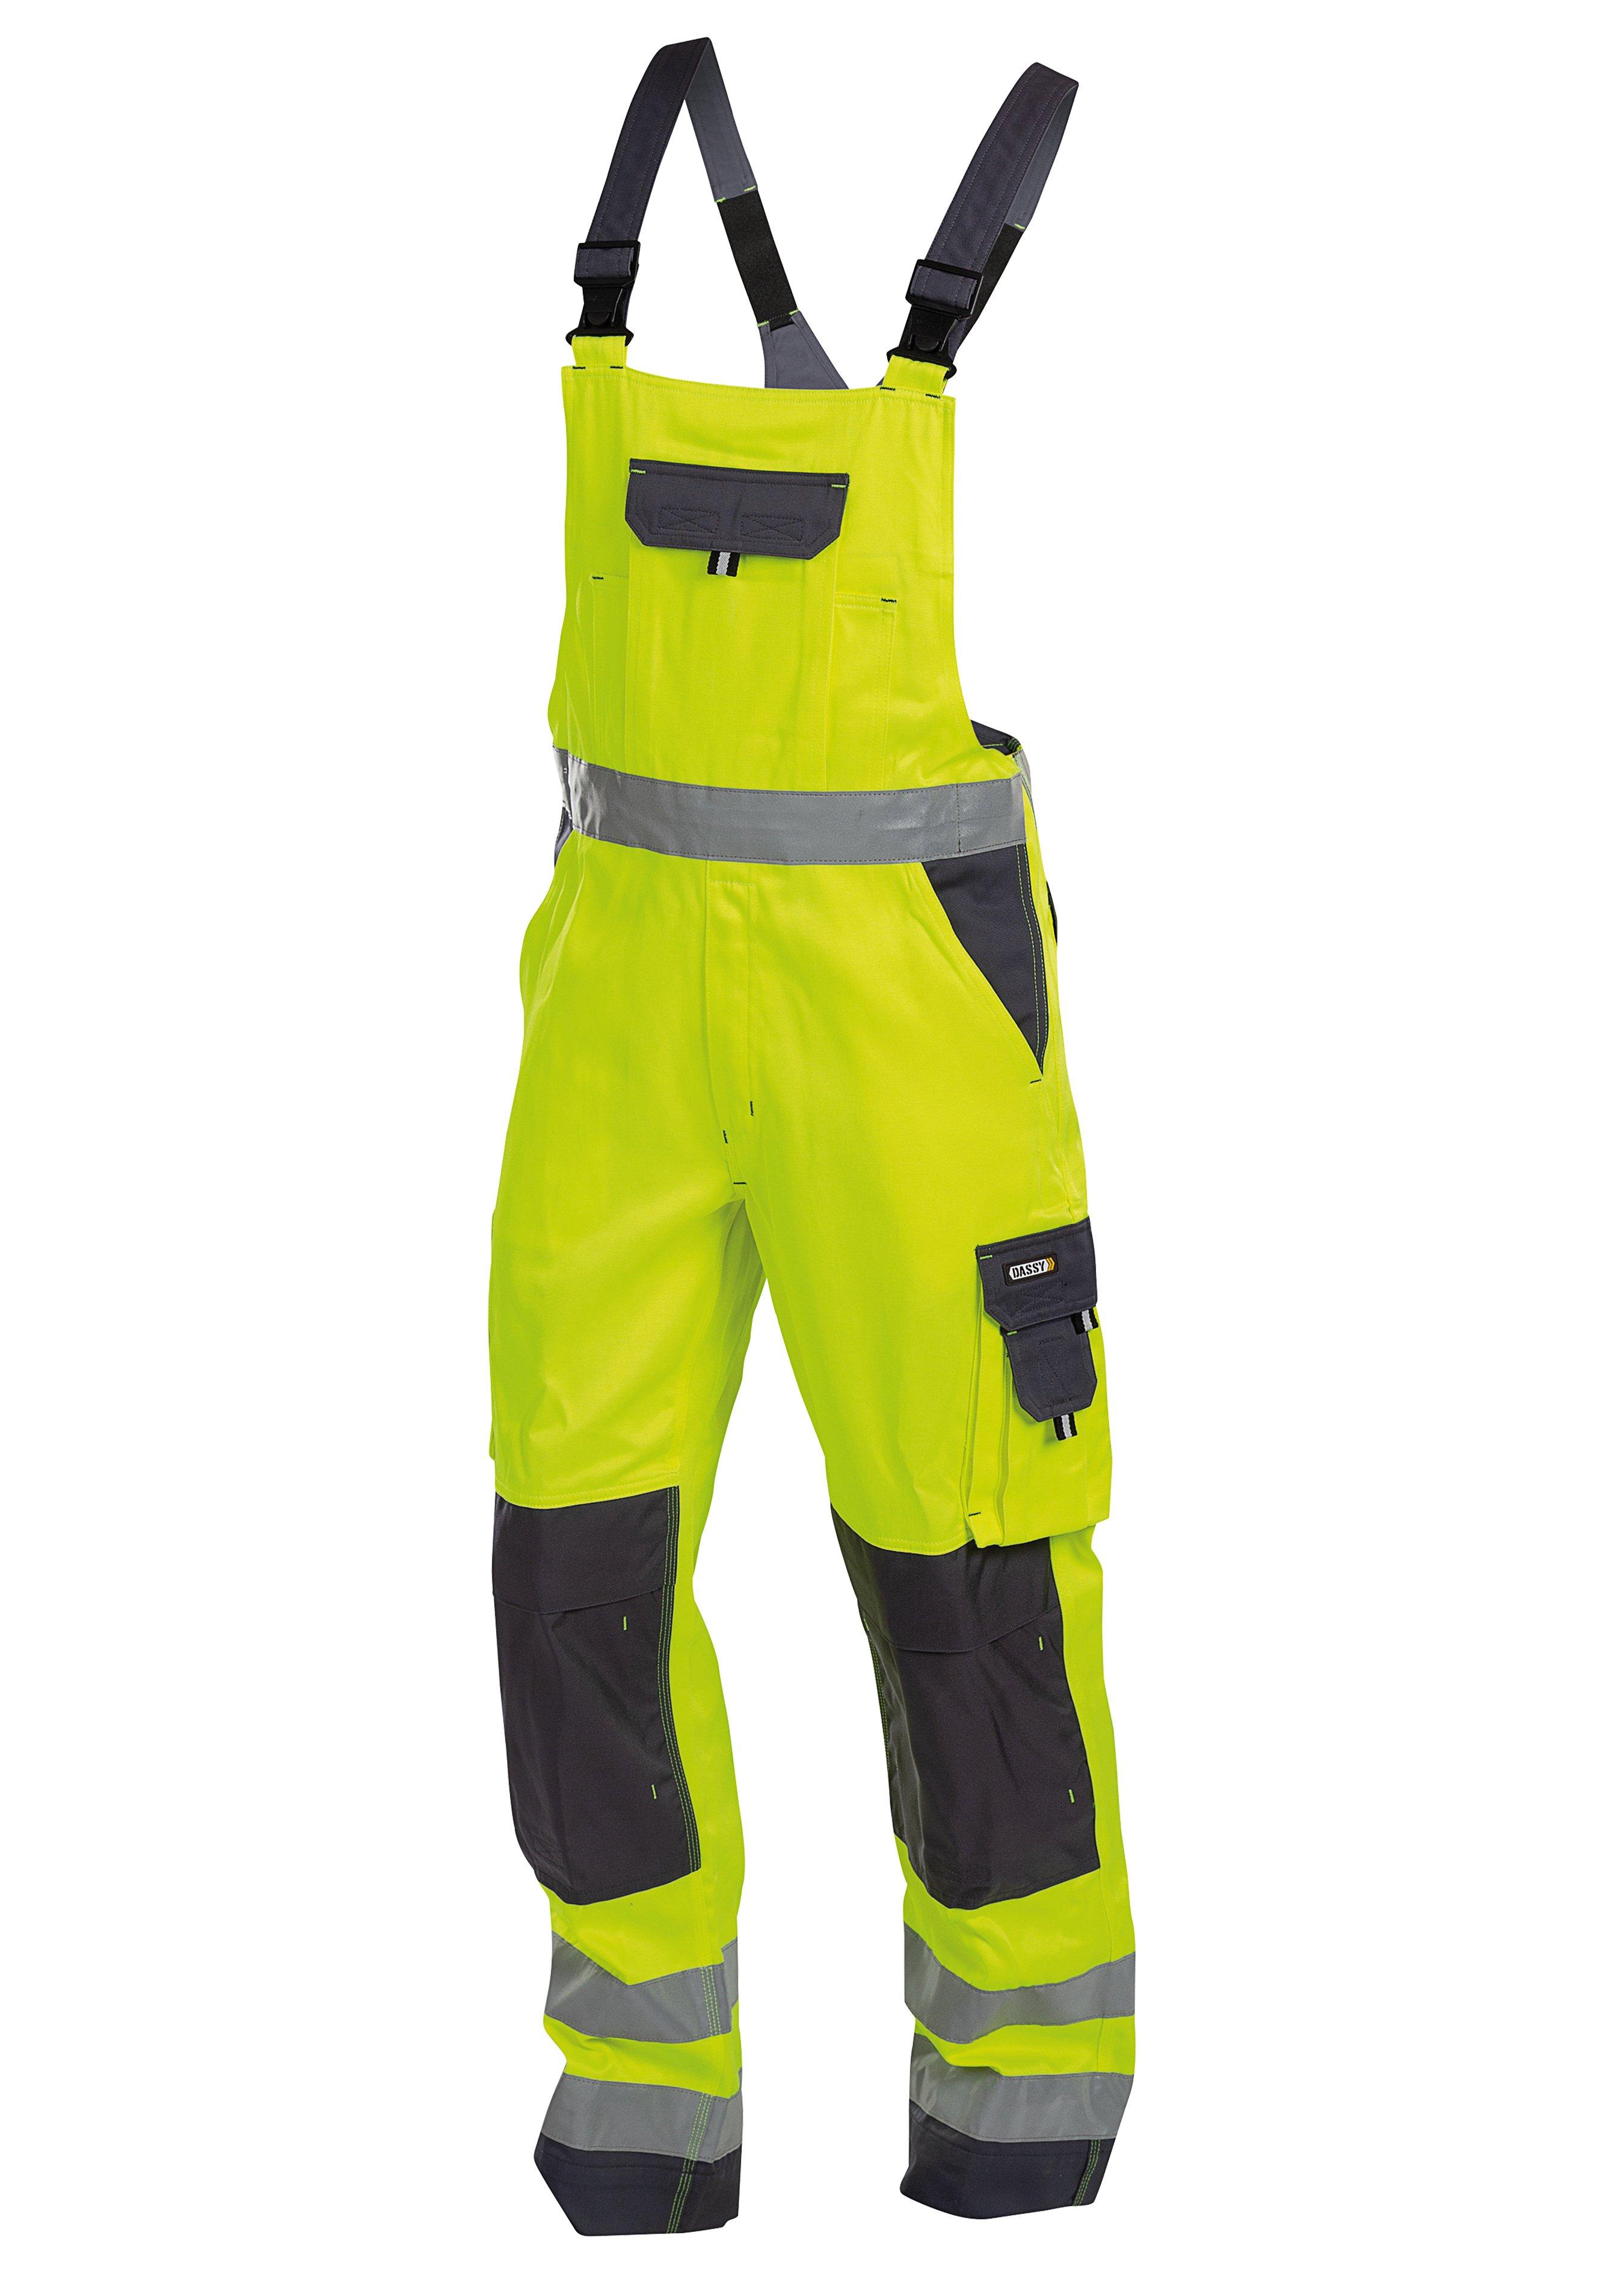 Dassy Warnschutz-Latzhose Toulouse 22745342 1